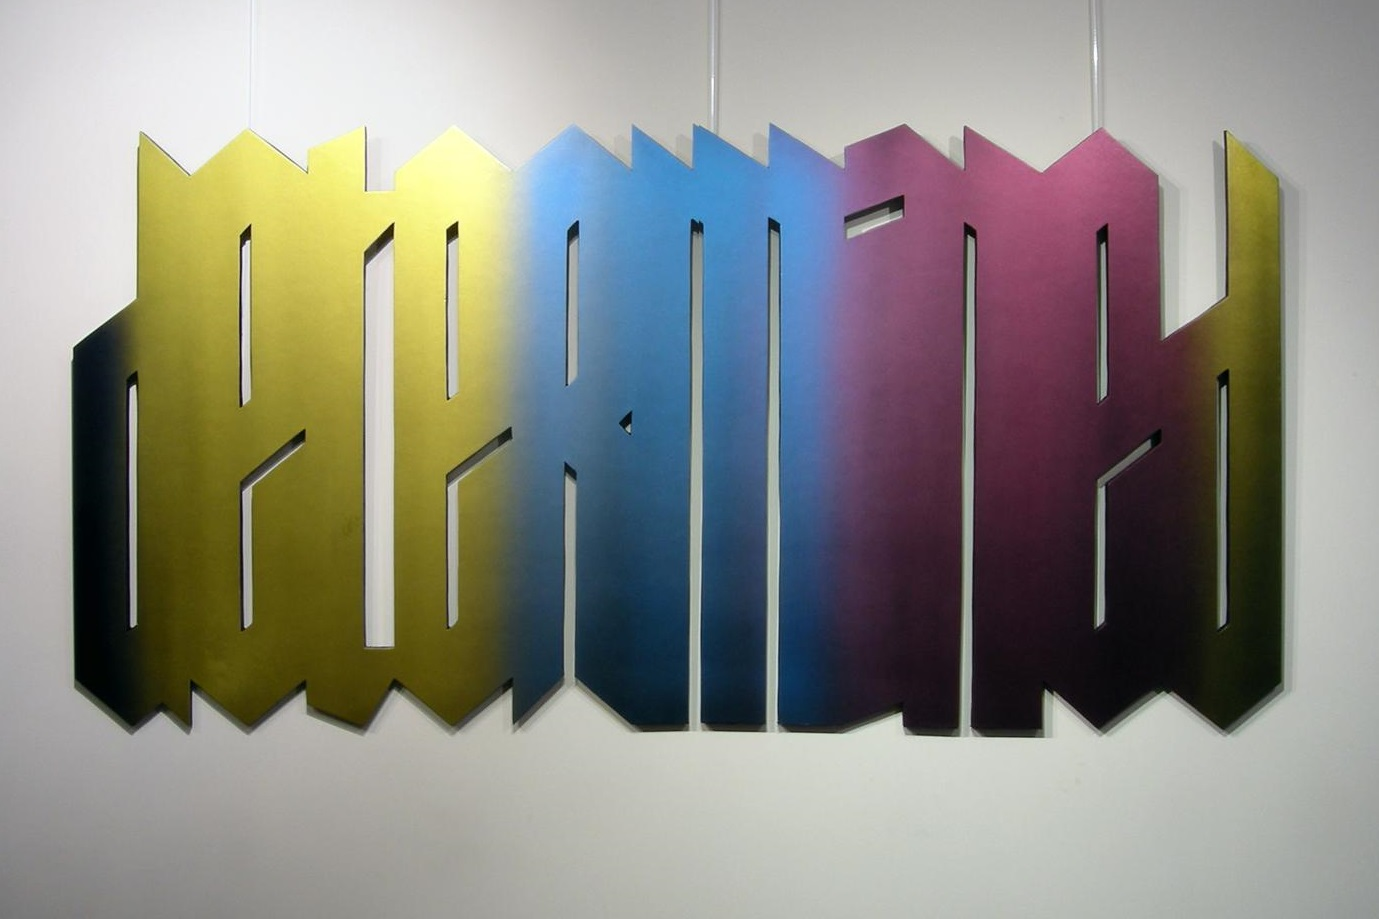 DETERMINED (2014) - Paul Muguet